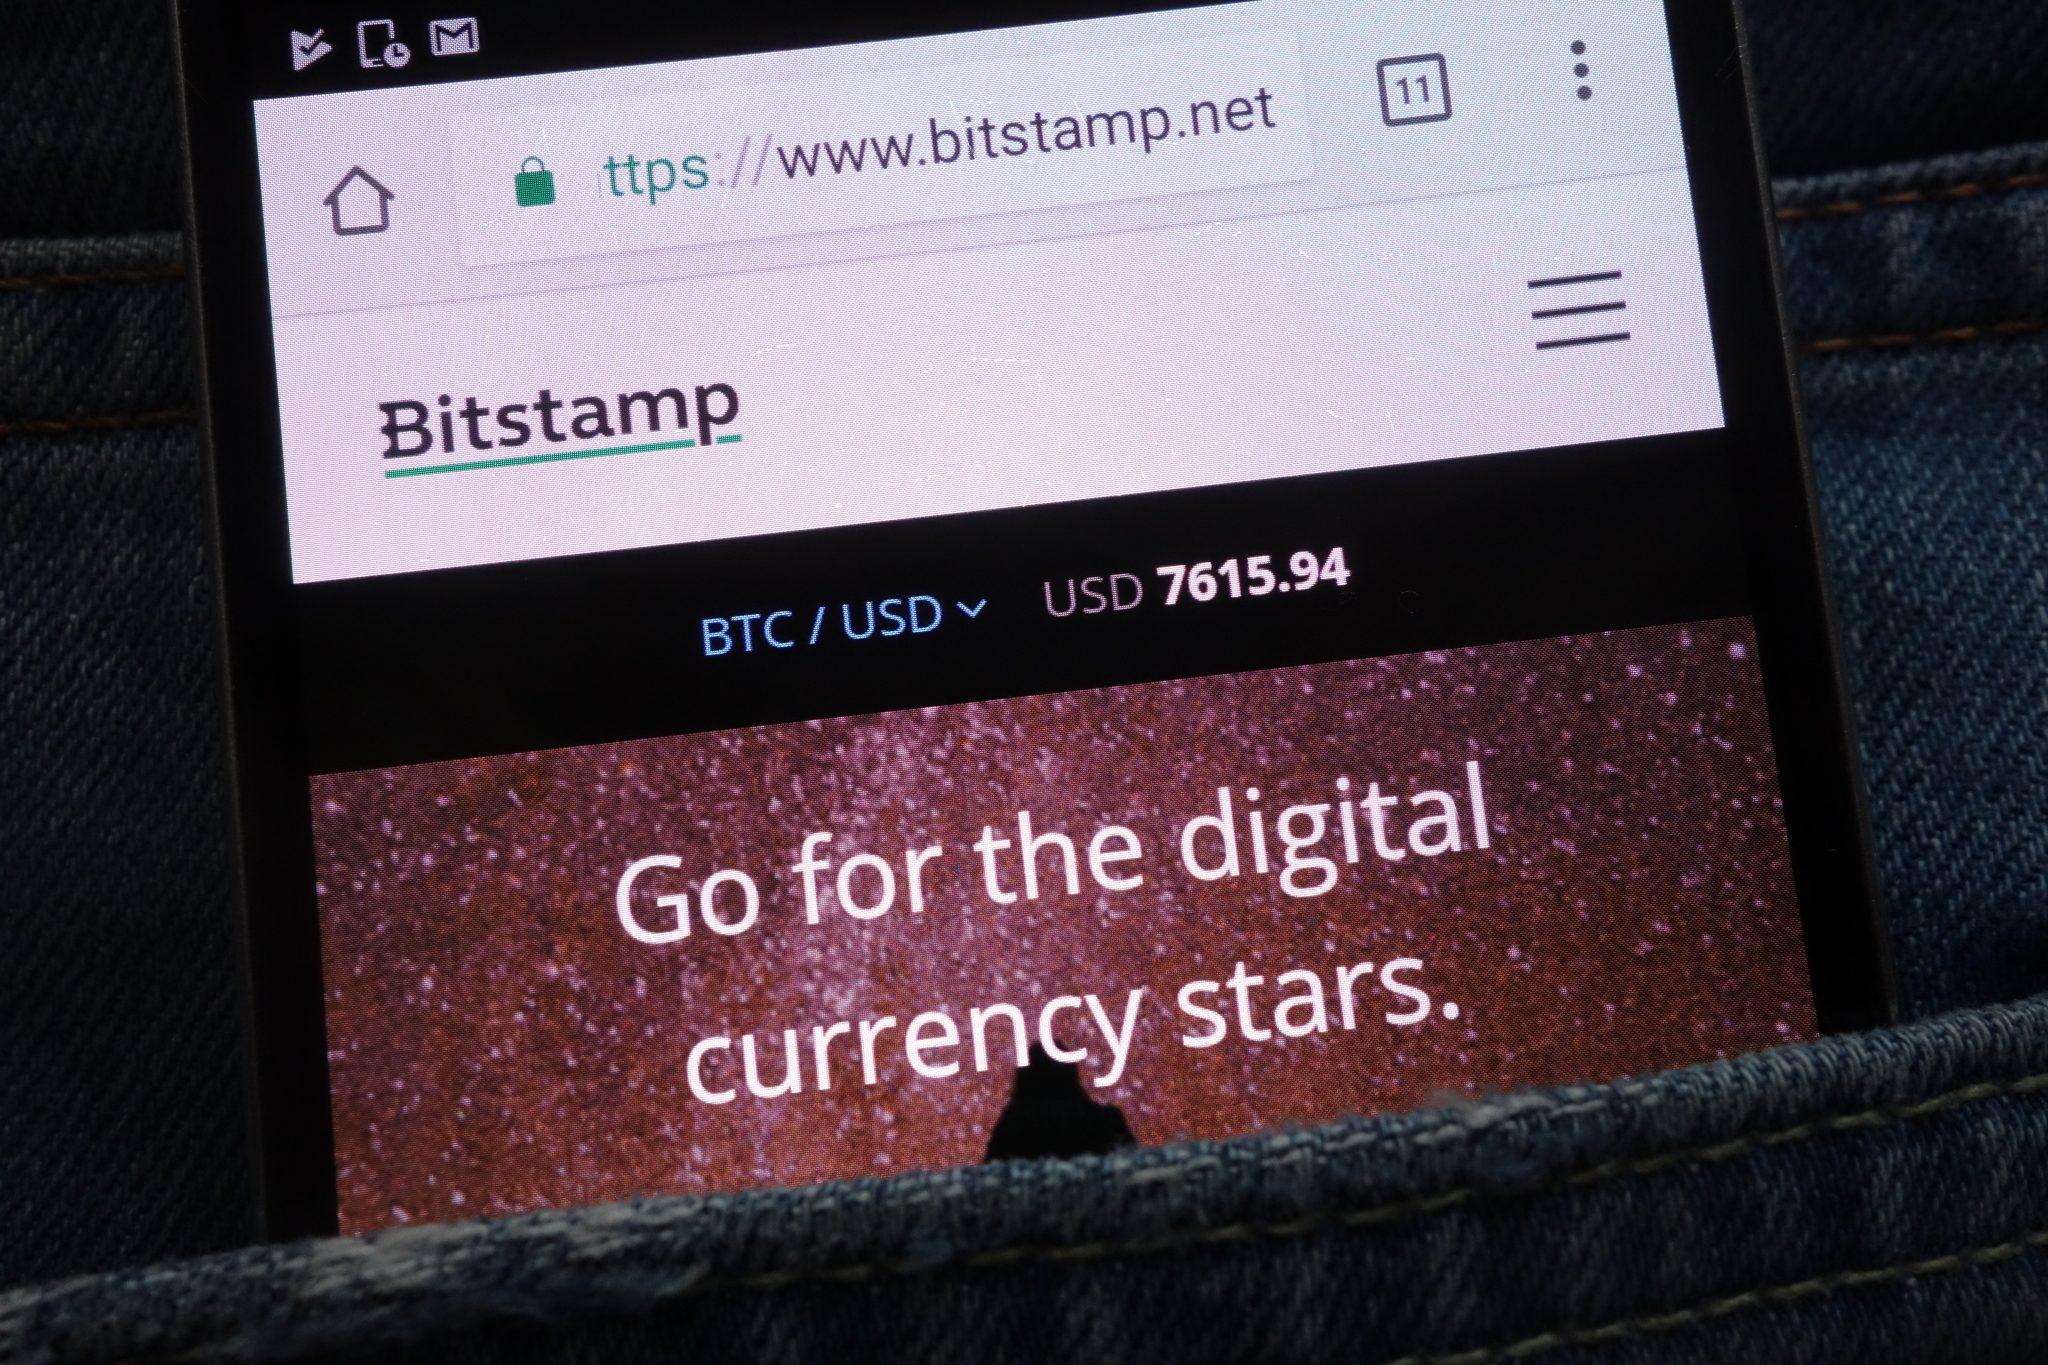 Bitstamp EurT